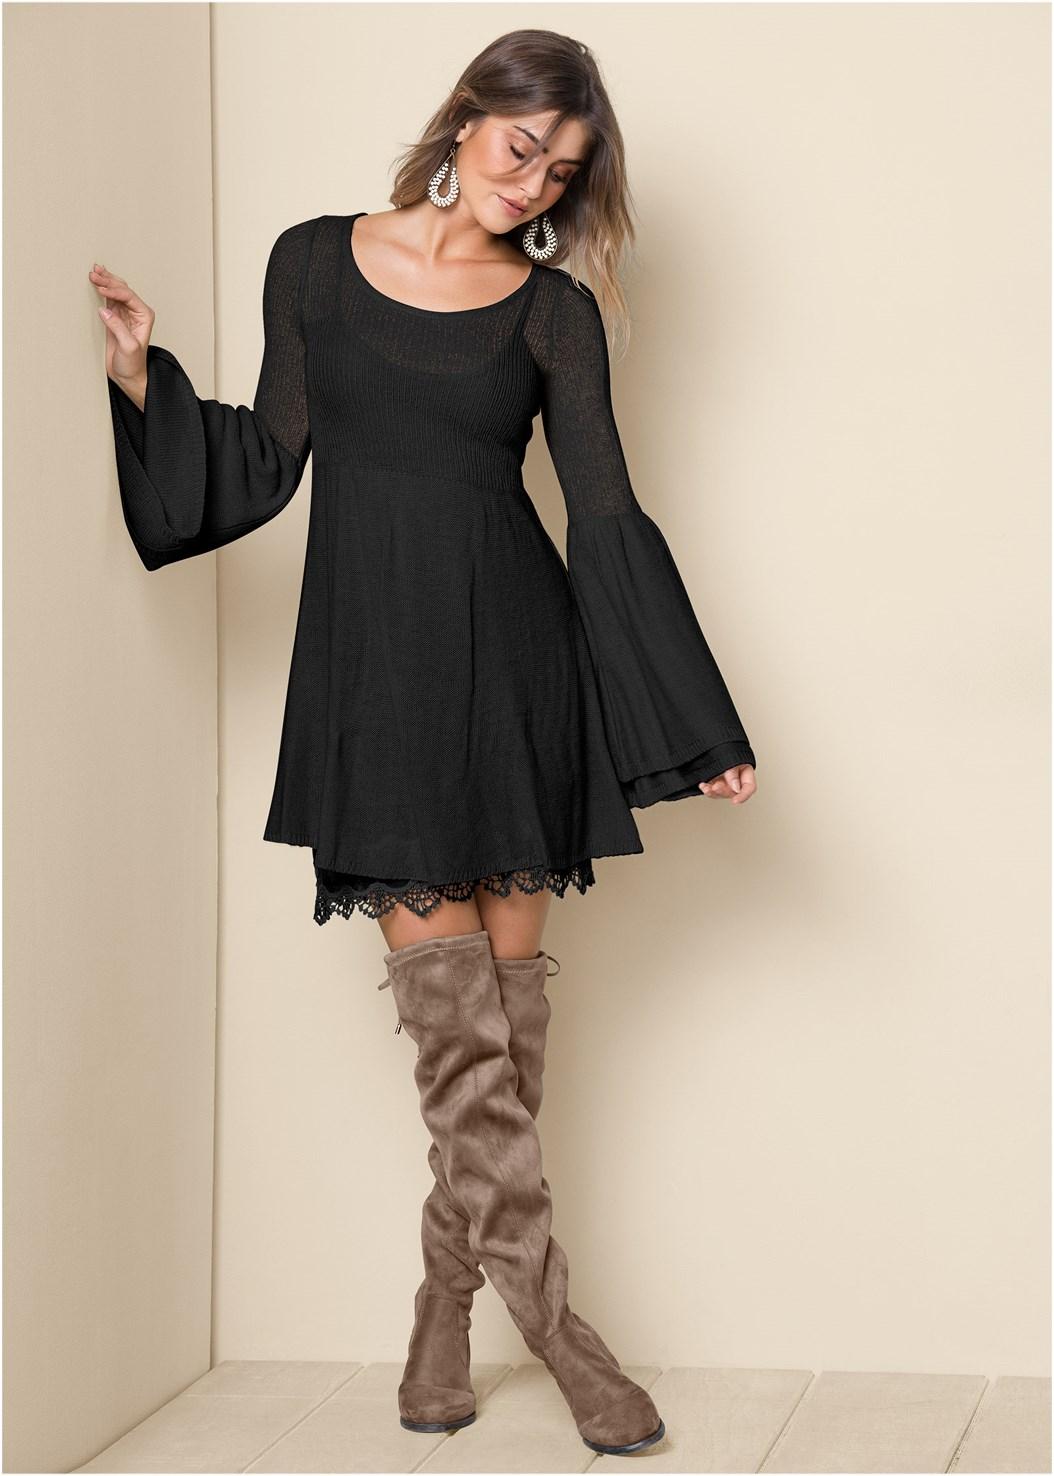 Boho Sweater Dress,Unlined Geo Lace Bra,Over The Knee Stretch Boots,Beaded Drop Earrings,Wide Velvet Belt,Circular Straw Bag